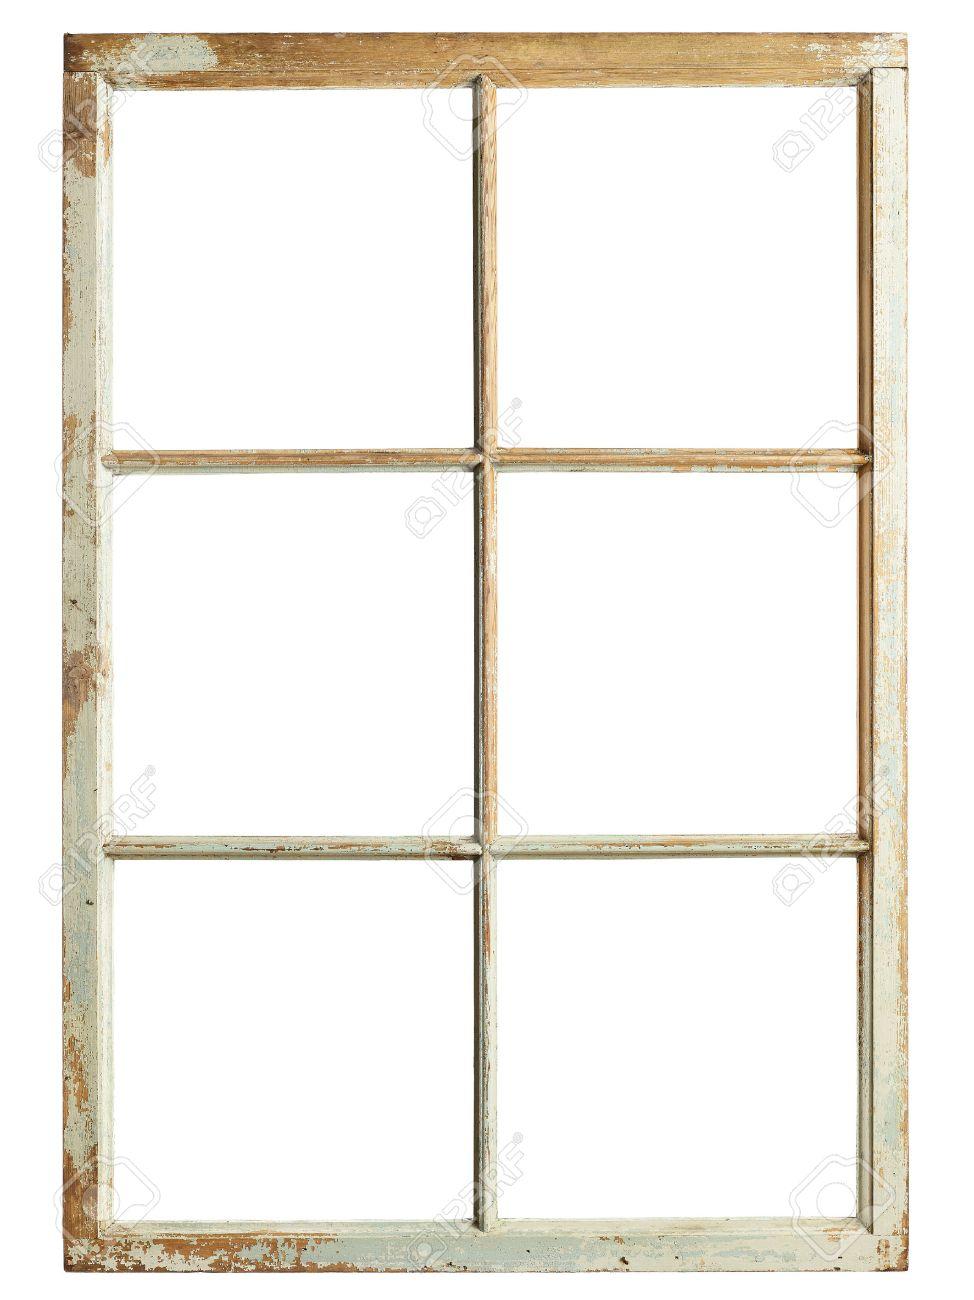 Old Window Old Window Frame Six Square Glazing Isolated Image Stock Photo